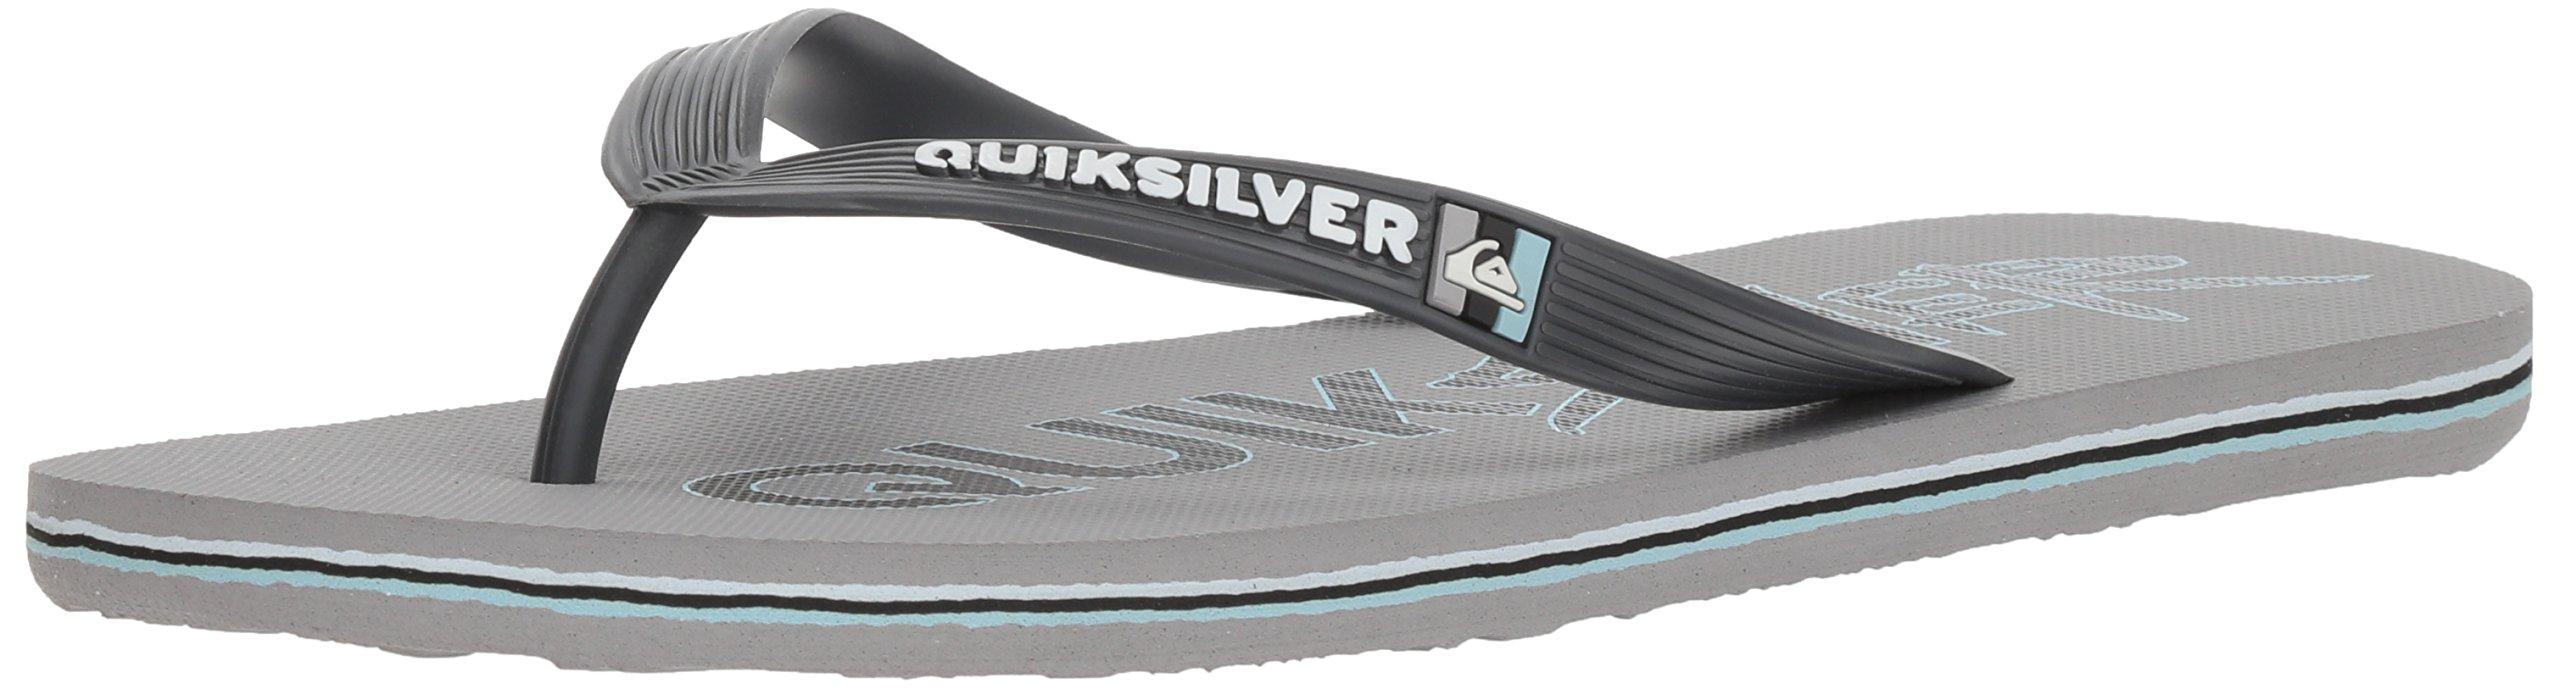 Quiksilver Men's Molokai Wordmark Sandal, Grey/Grey/Black, 11 M US